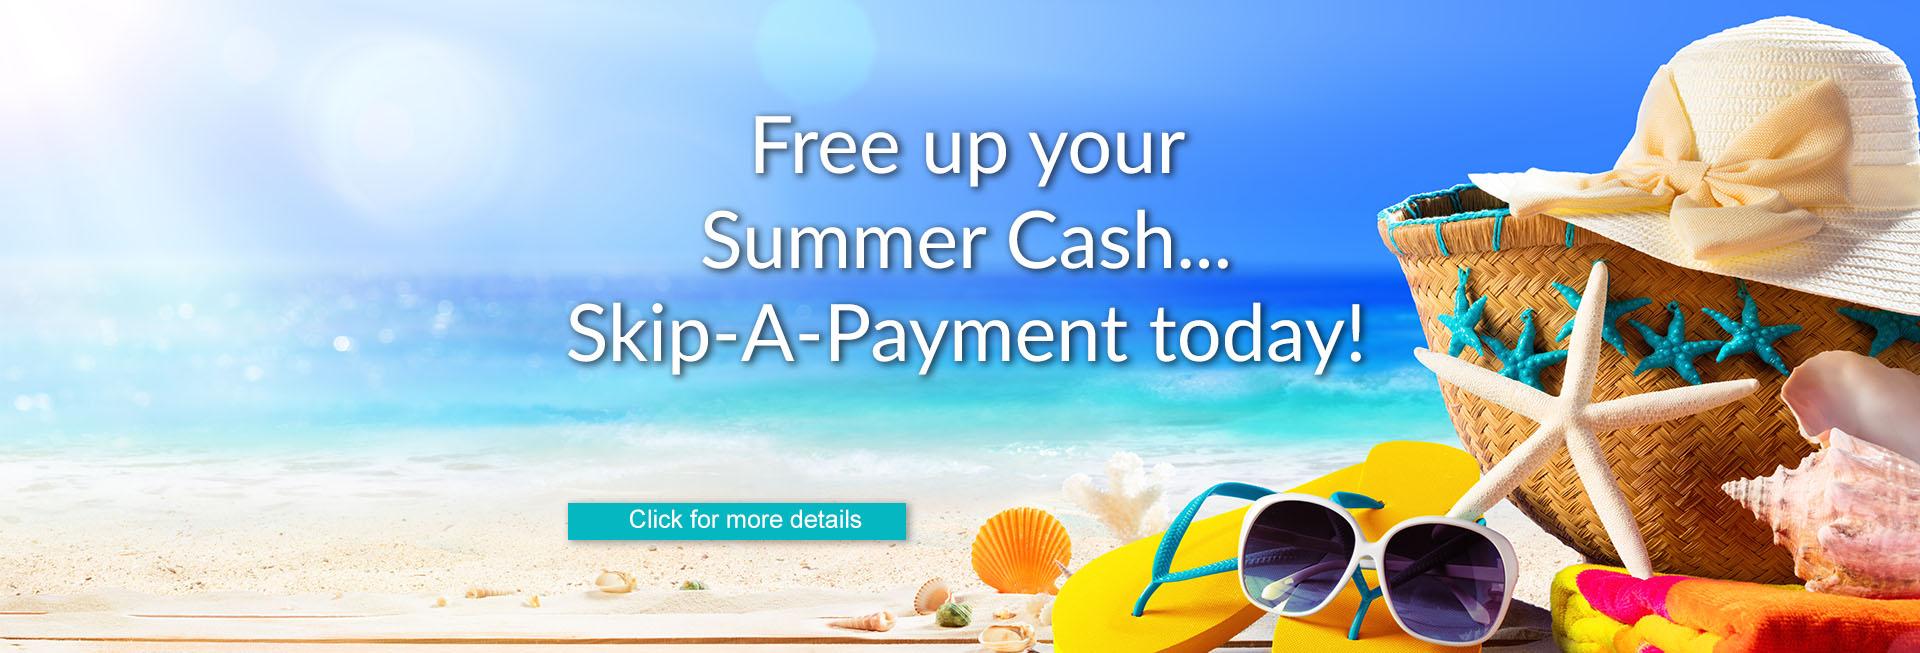 Summer Skip-A-Payment website graphic